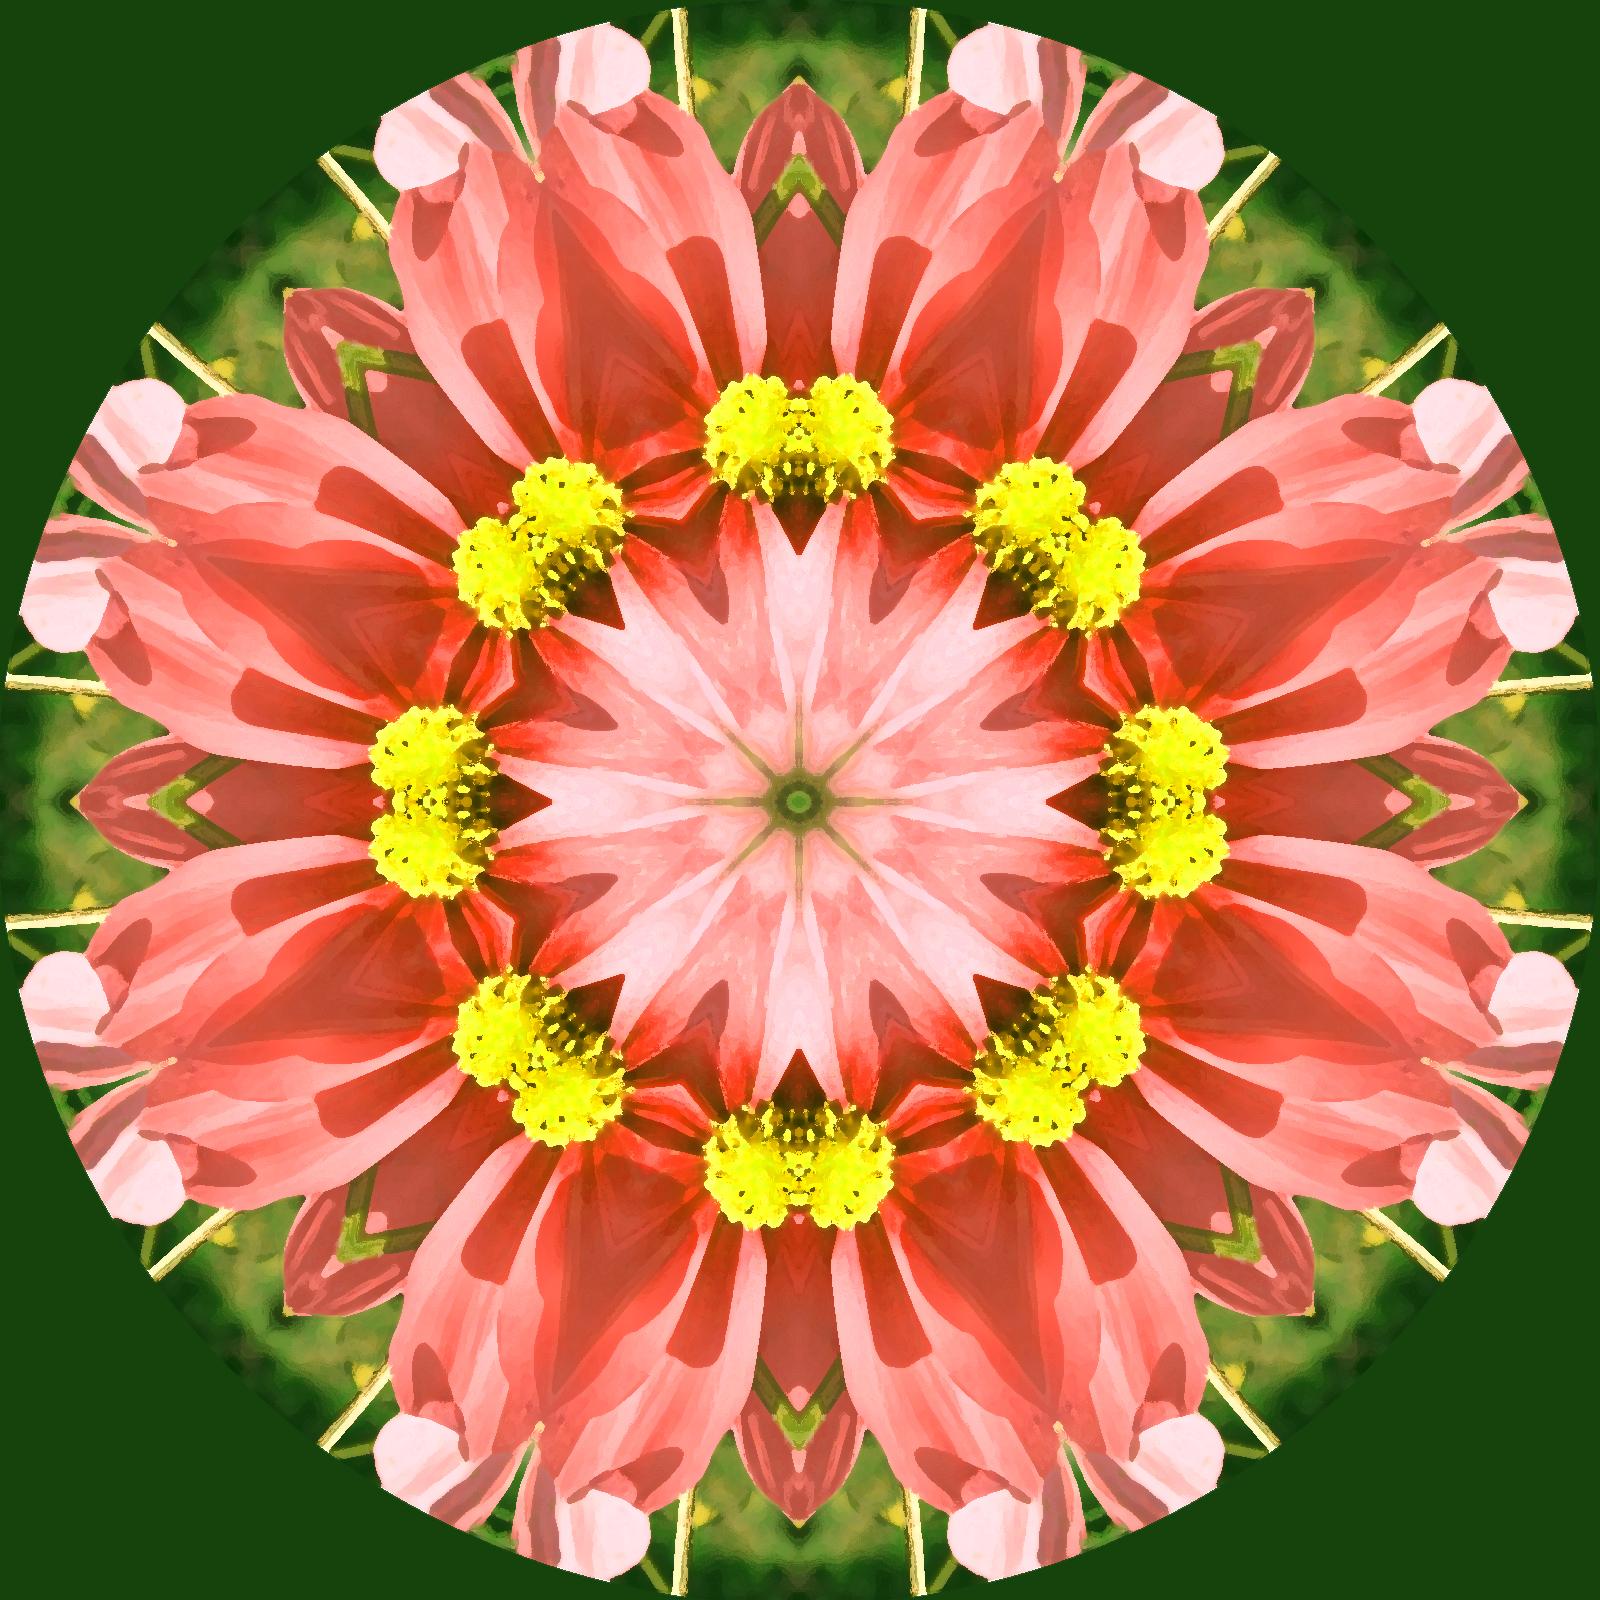 kaleidoscope flower mandala, Ornament, Graphic, Kaleidoscope, Lace, HQ Photo